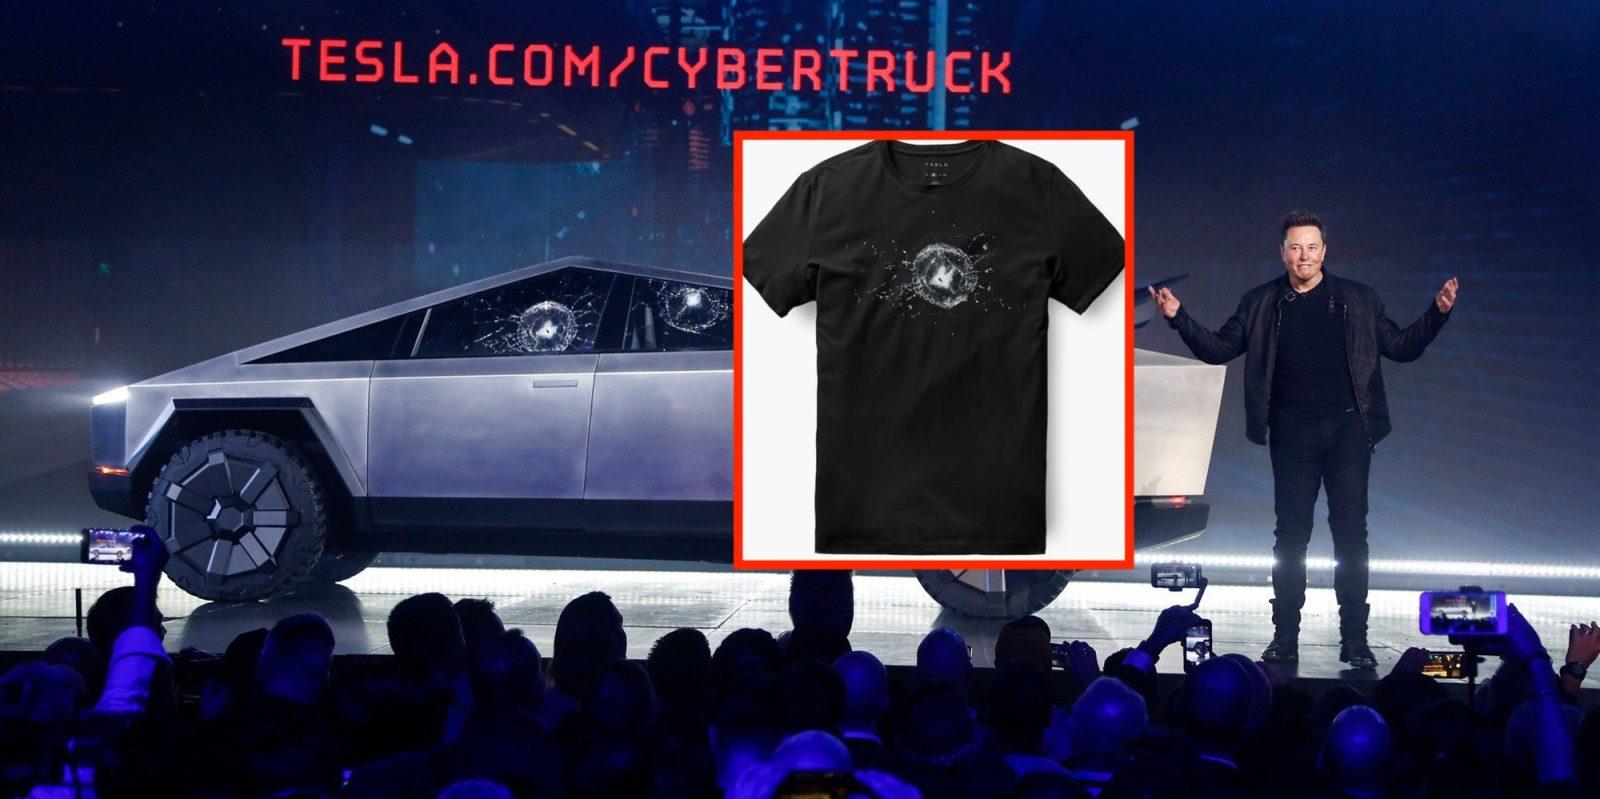 Tesla turns Cybertruck window-breaking mishap into t-shirt, launches new apparel